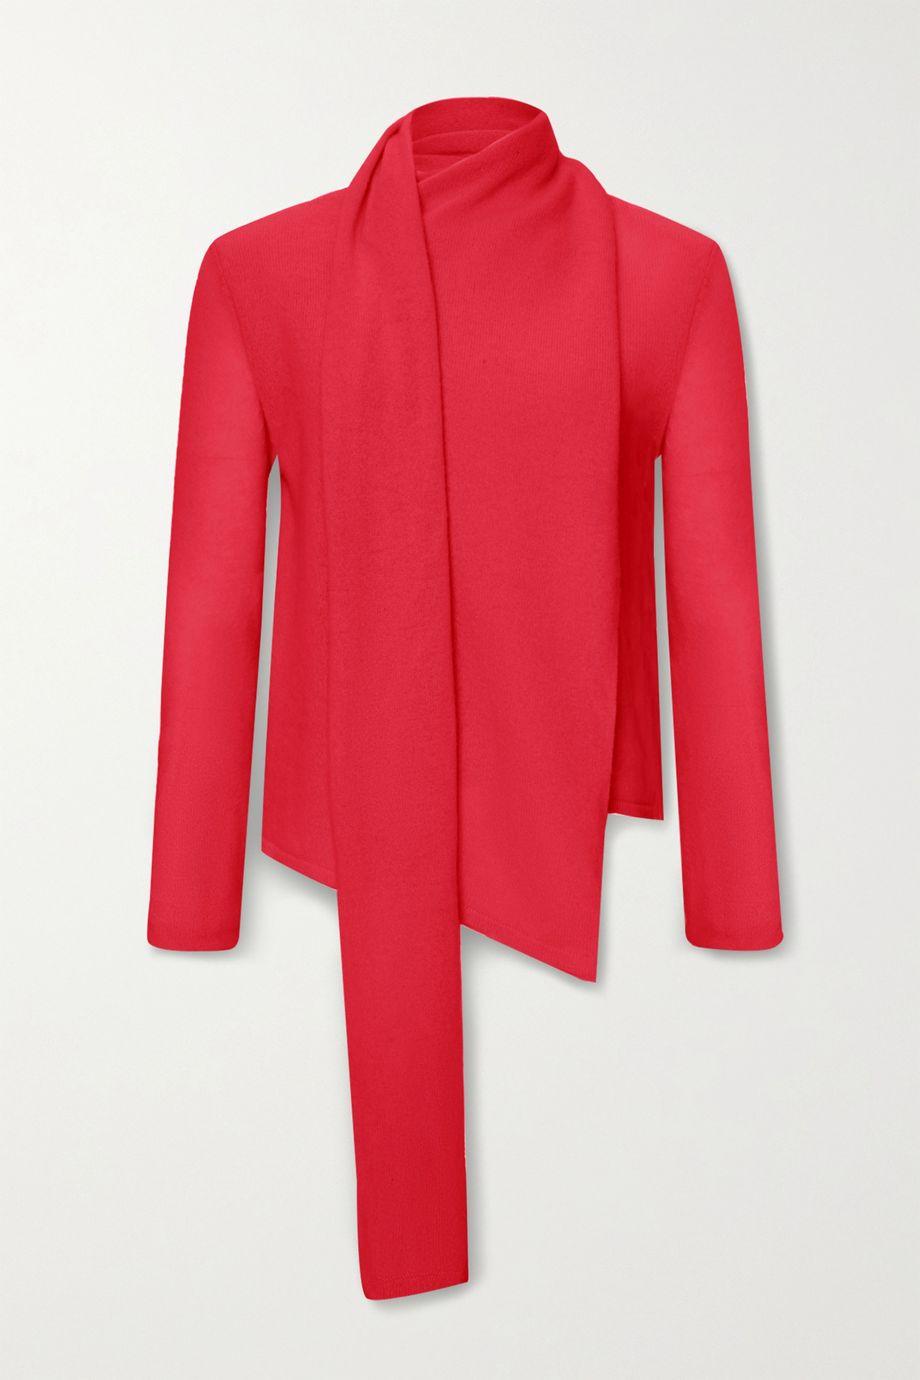 LAPOINTE Draped cashmere sweater